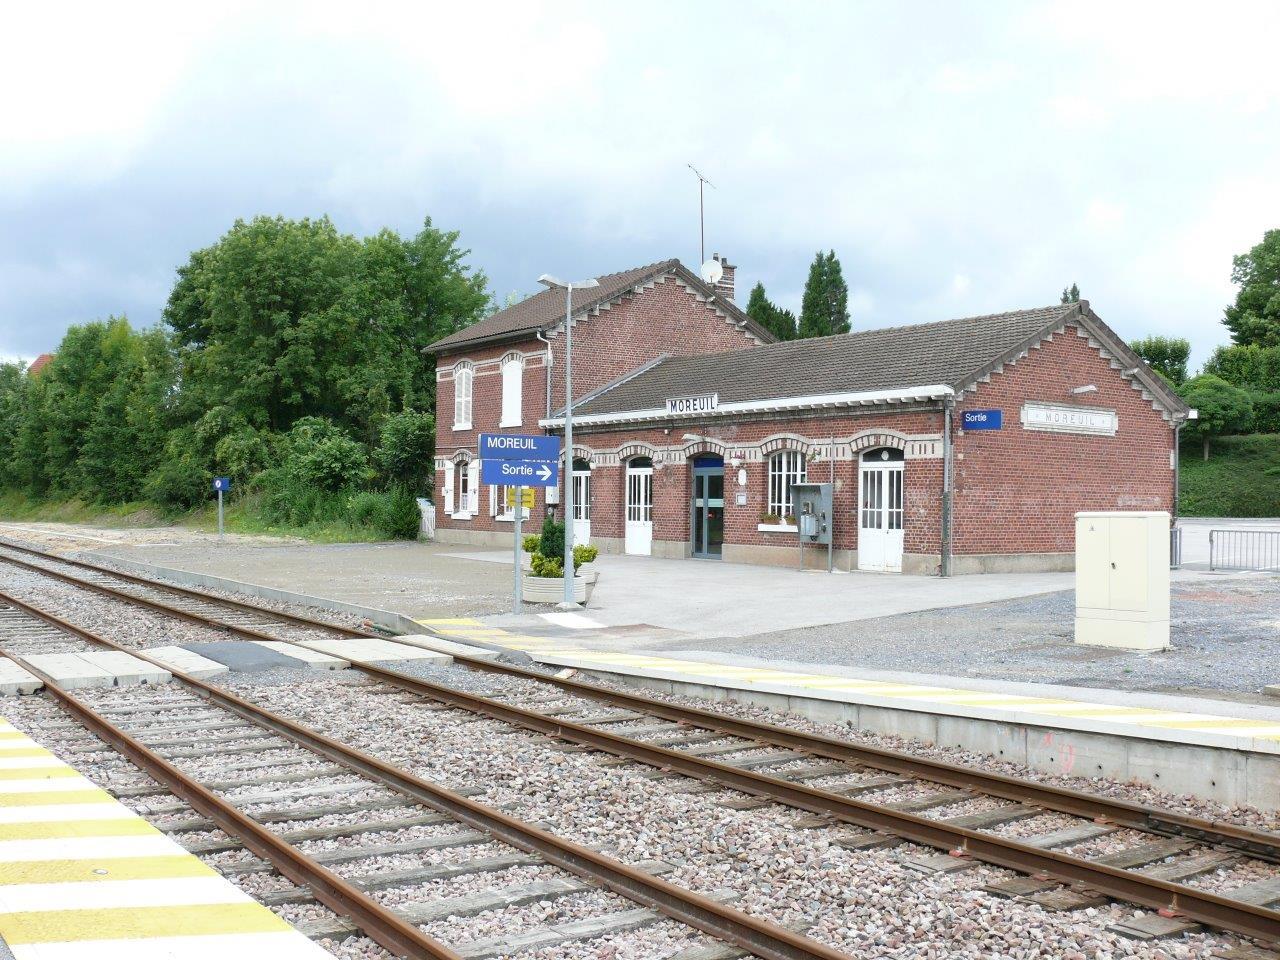 gare-de-moreuil-train-station